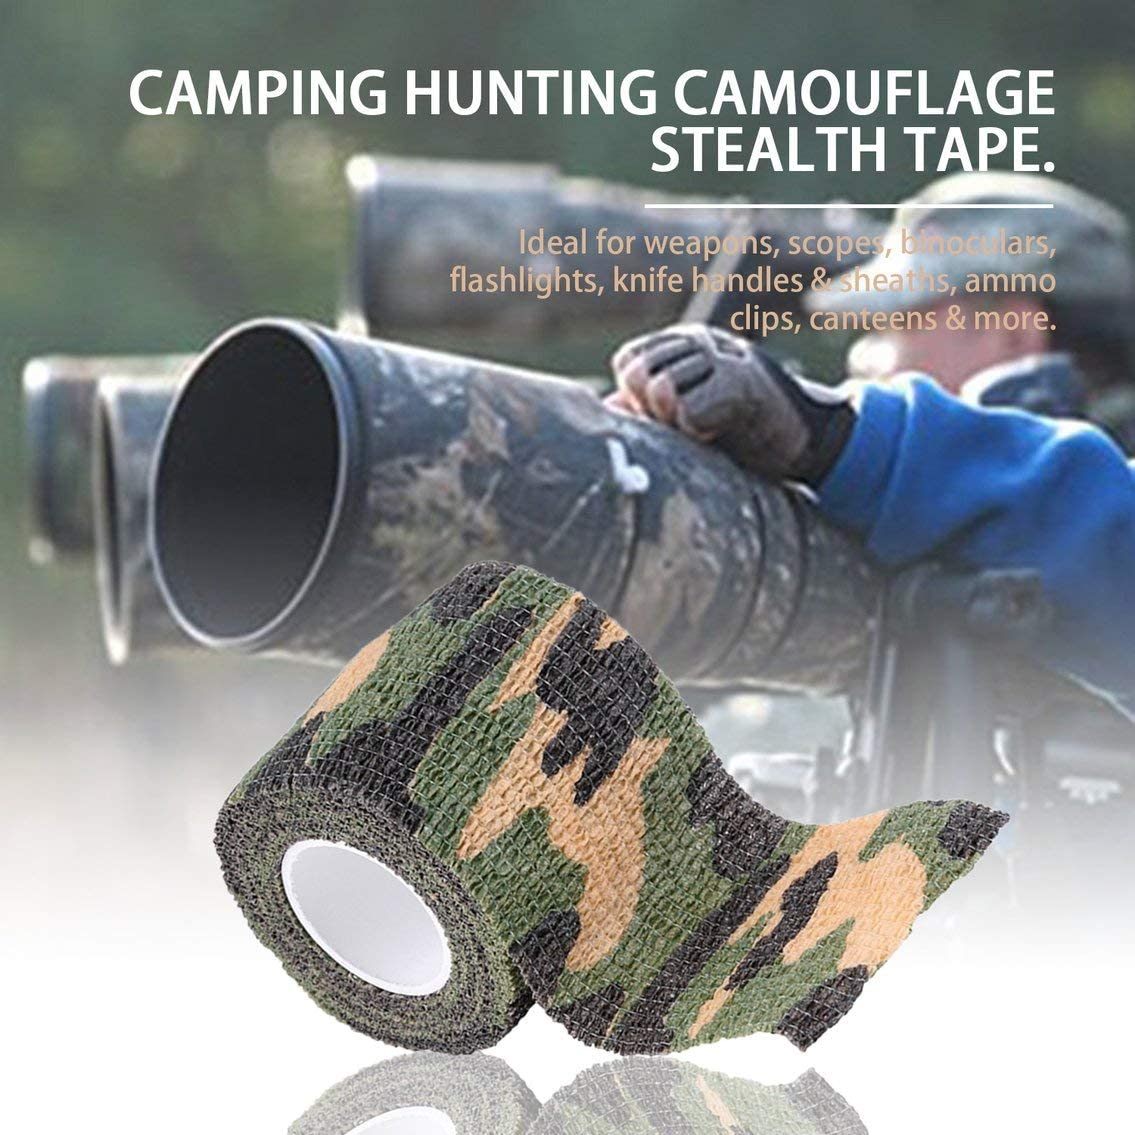 John Agdomarvb /Élastique Camouflage /Étanche en Plein Air Chasse Camping Furtif Camo Wrap Ruban Militaire Airsoft Paintball Stretch Bandage